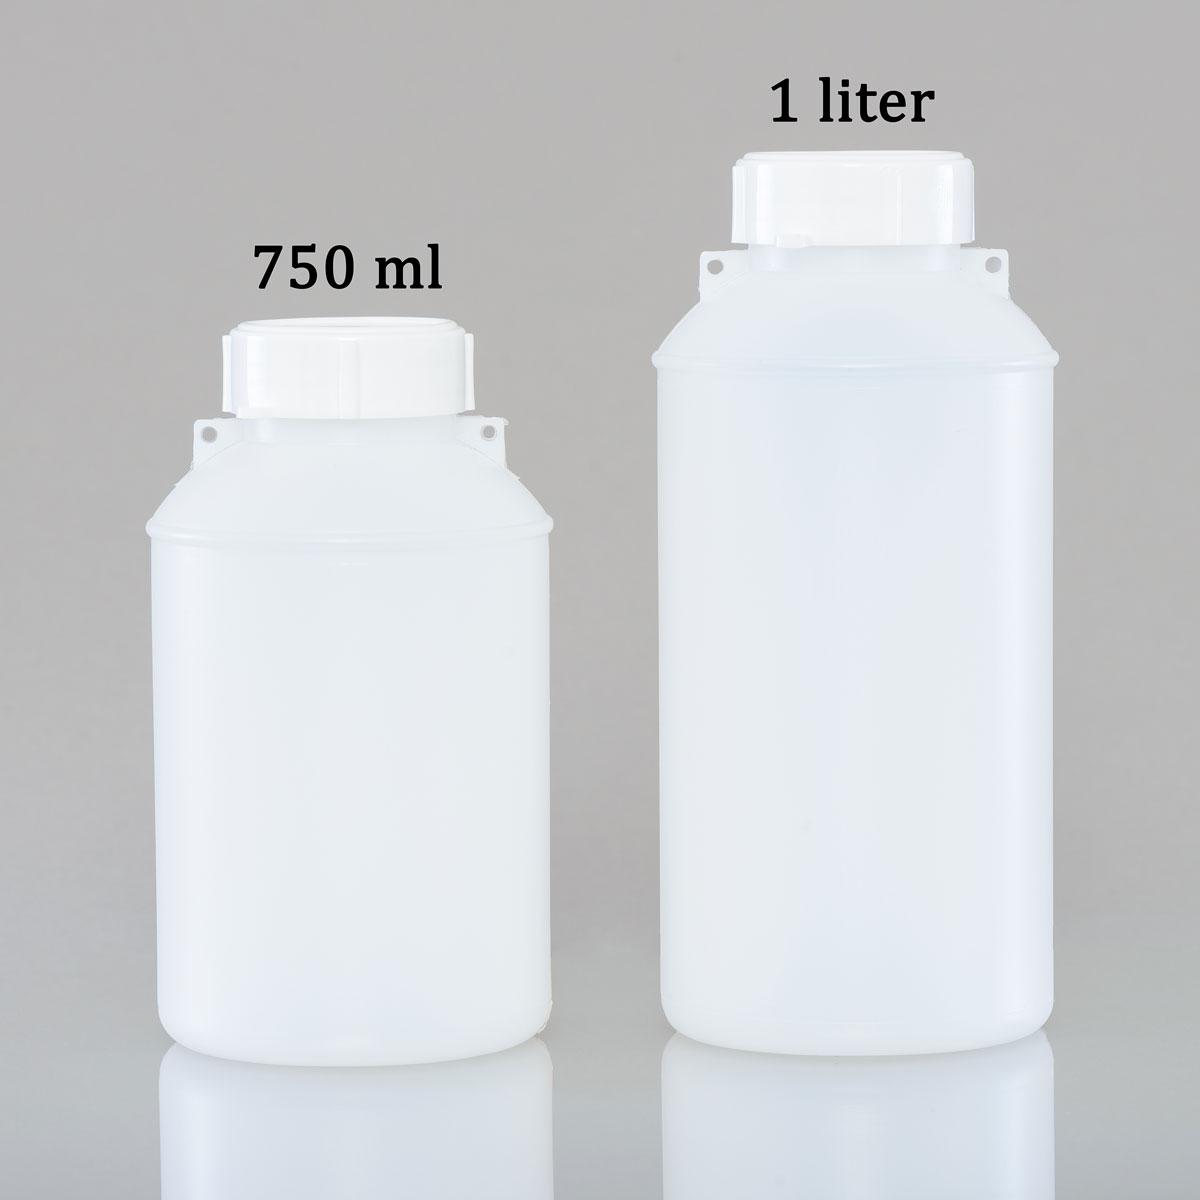 http://fuelsamplebottles.com/wp-content/uploads/gulsby-packaging-003-1200x.jpg